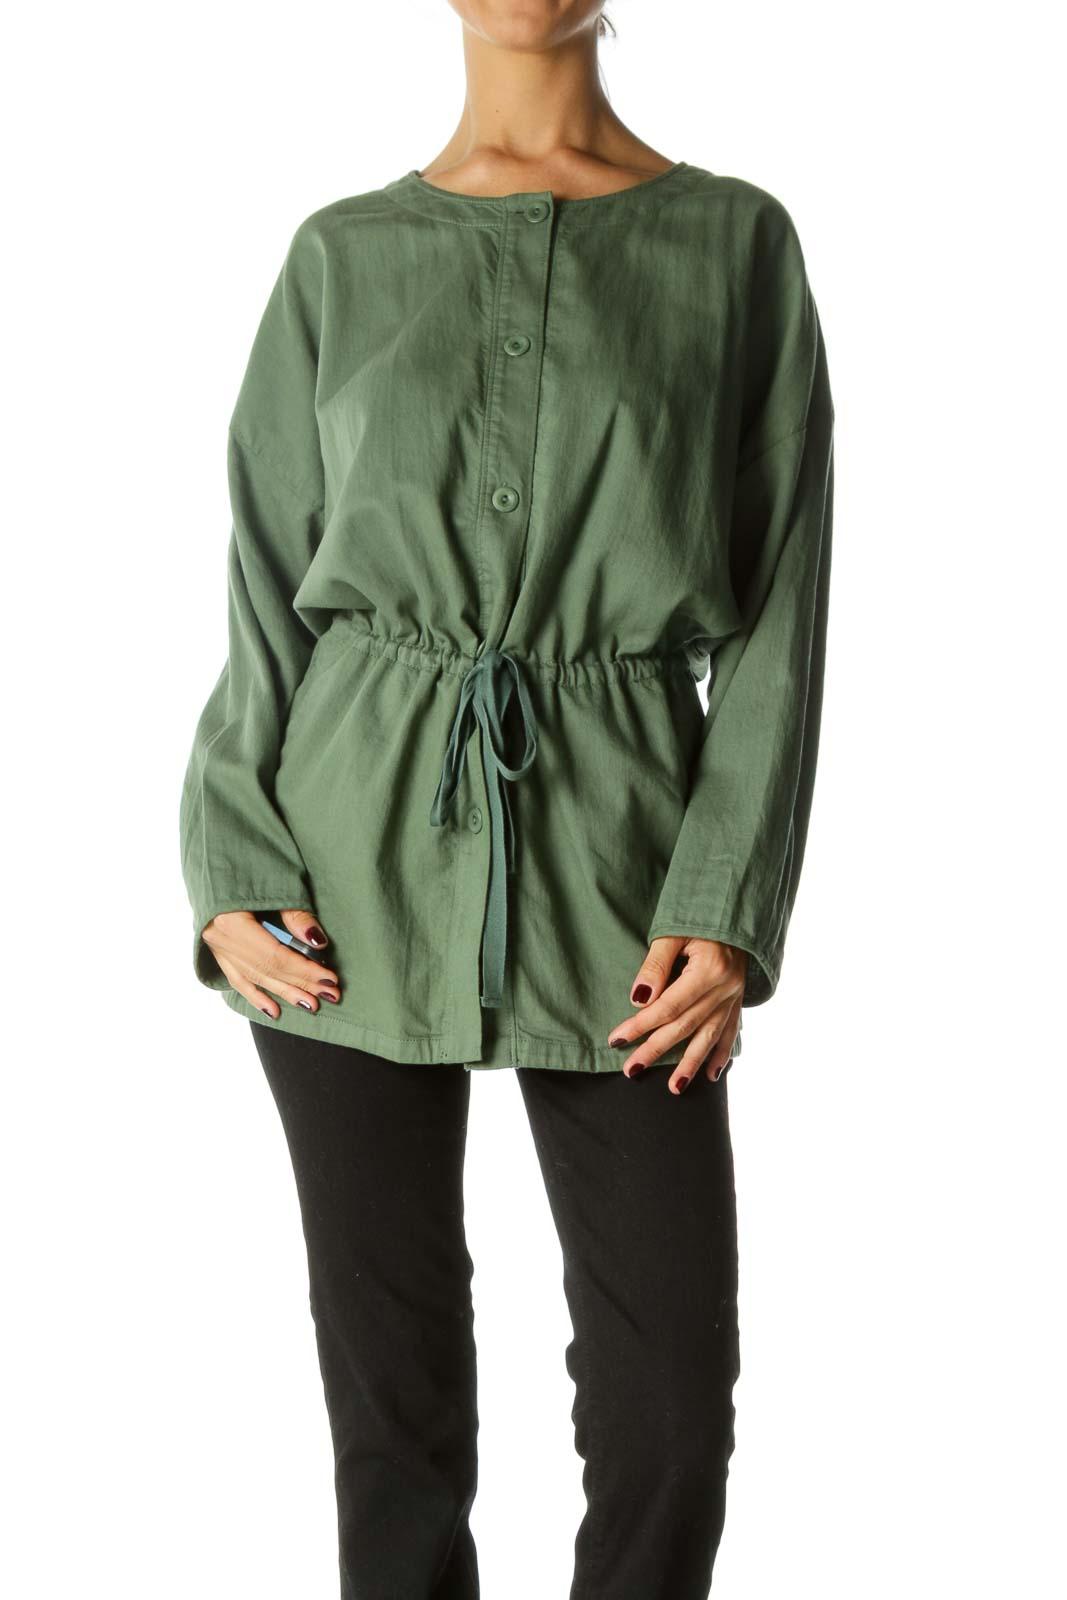 Green Light Weight Round Neck Jacket Front